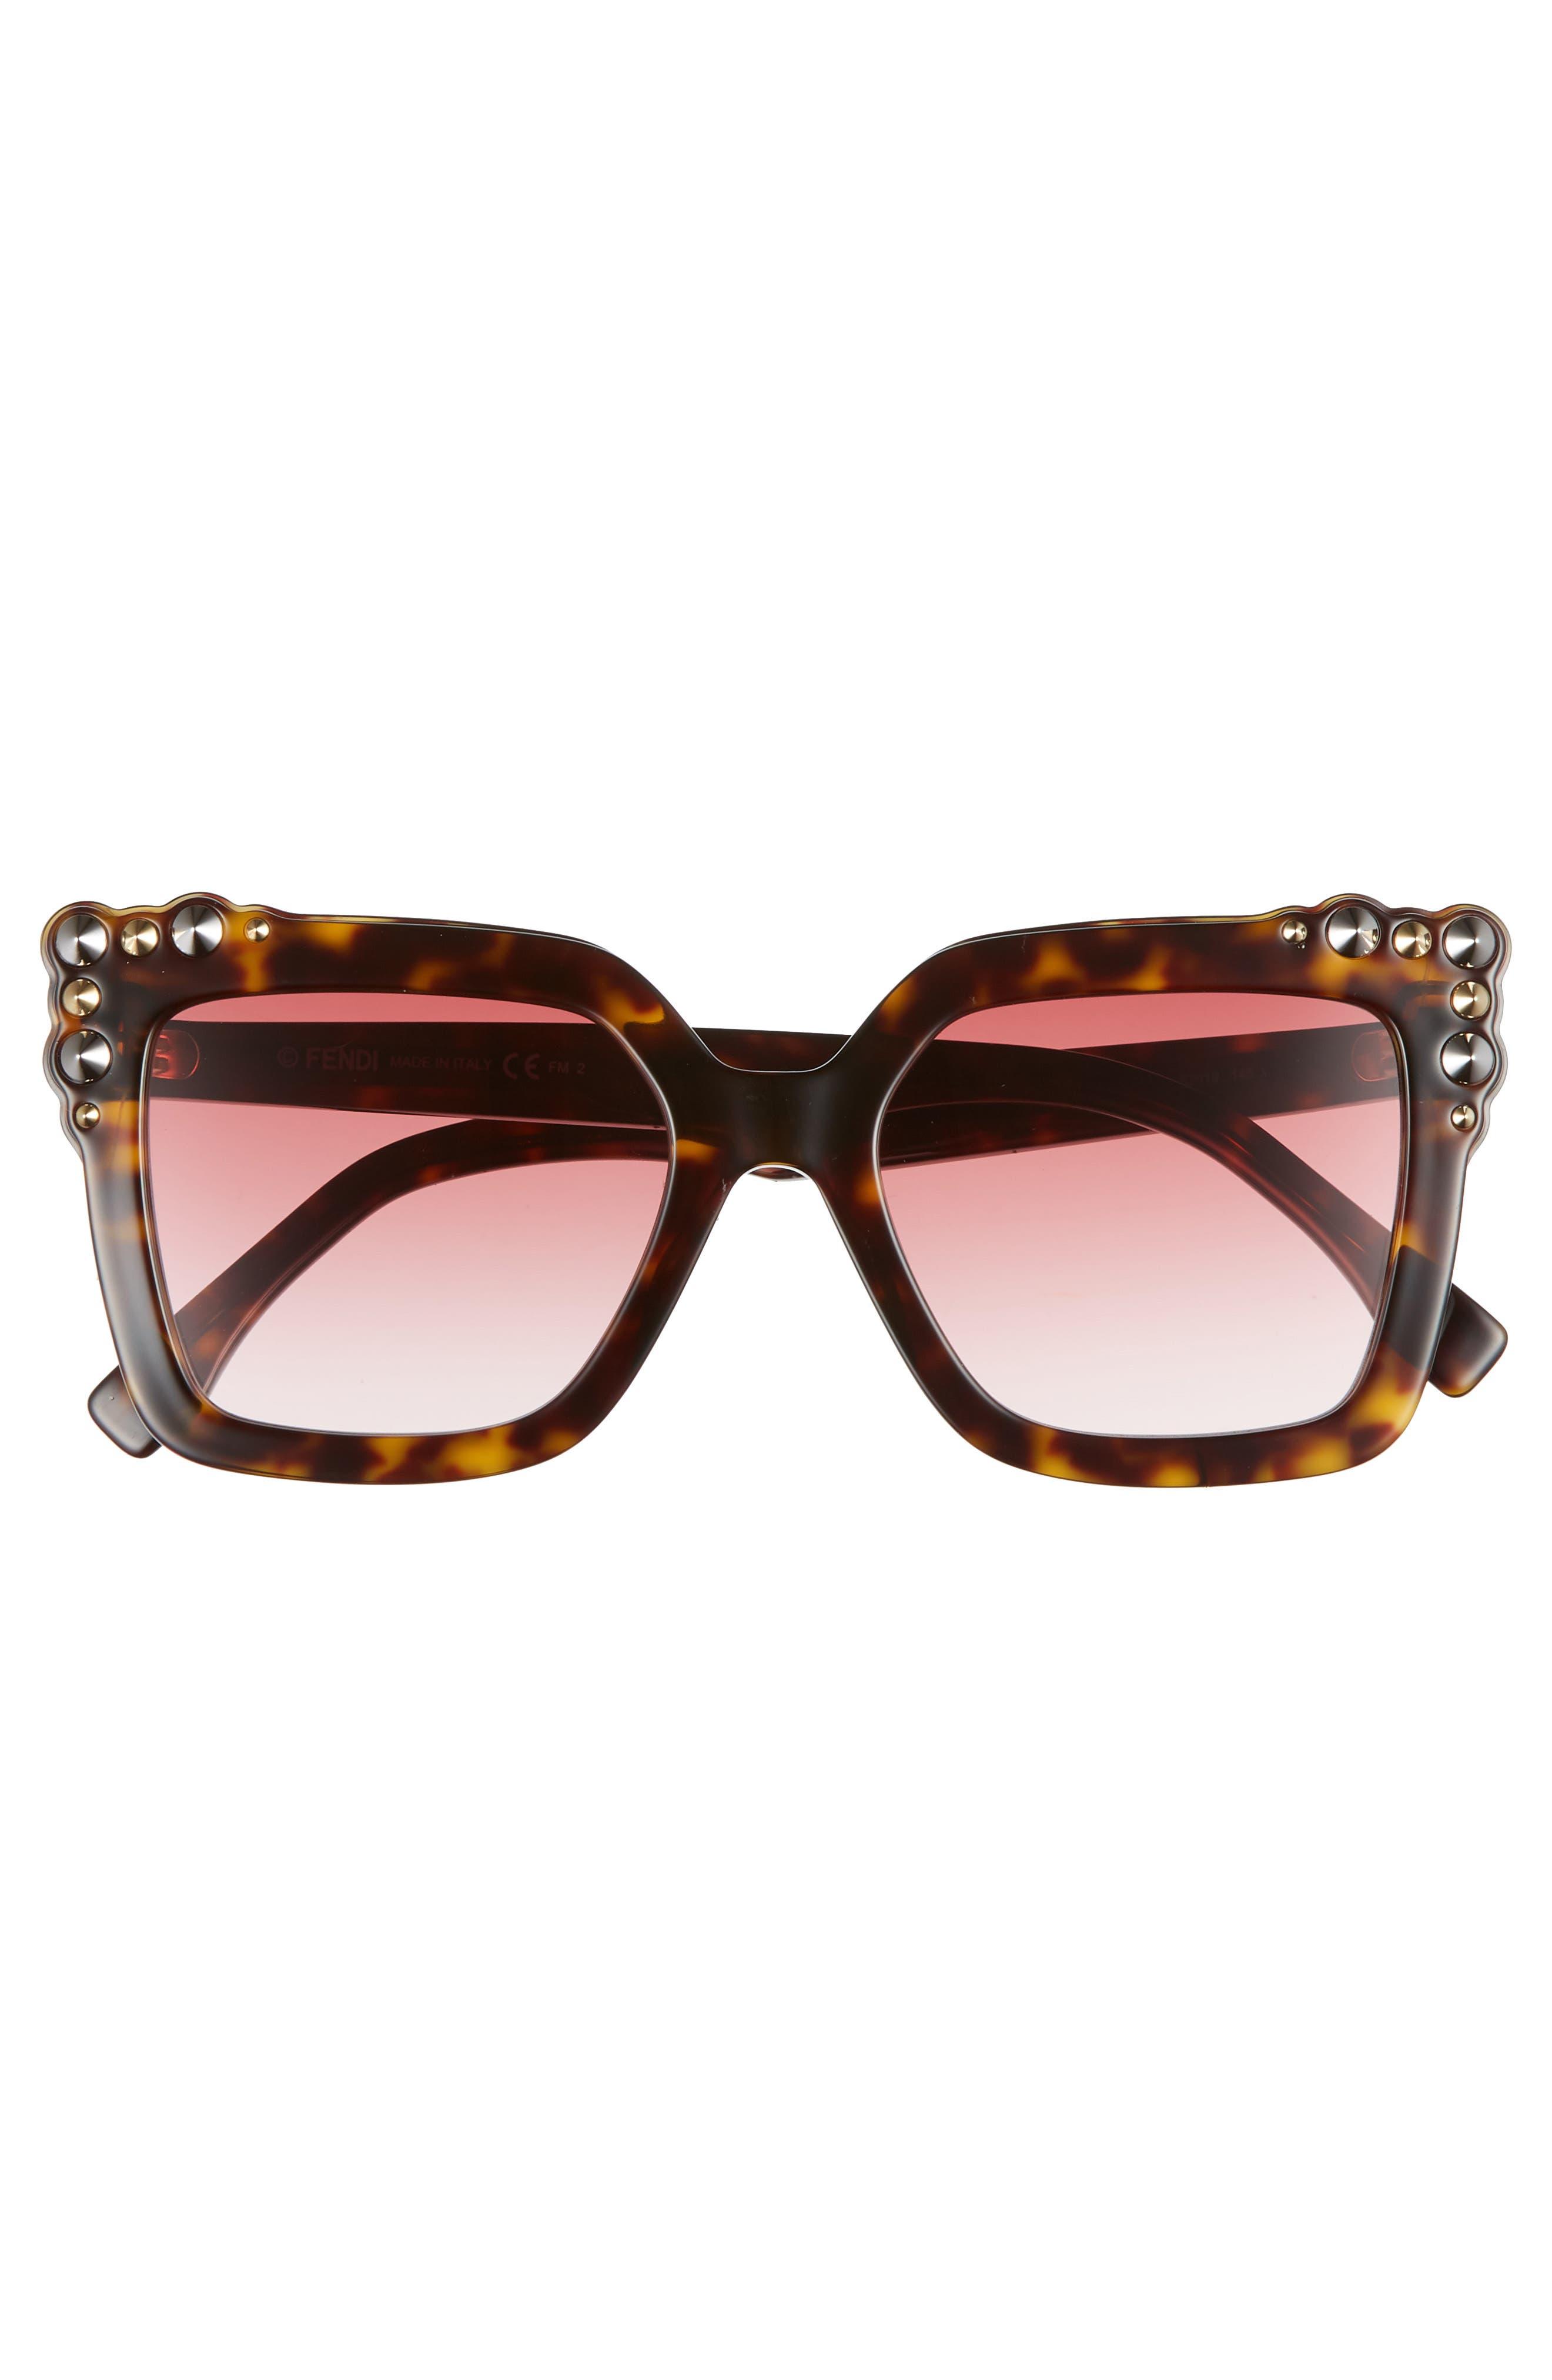 52mm Gradient Cat Eye Sunglasses,                             Alternate thumbnail 3, color,                             DARK HAVANA